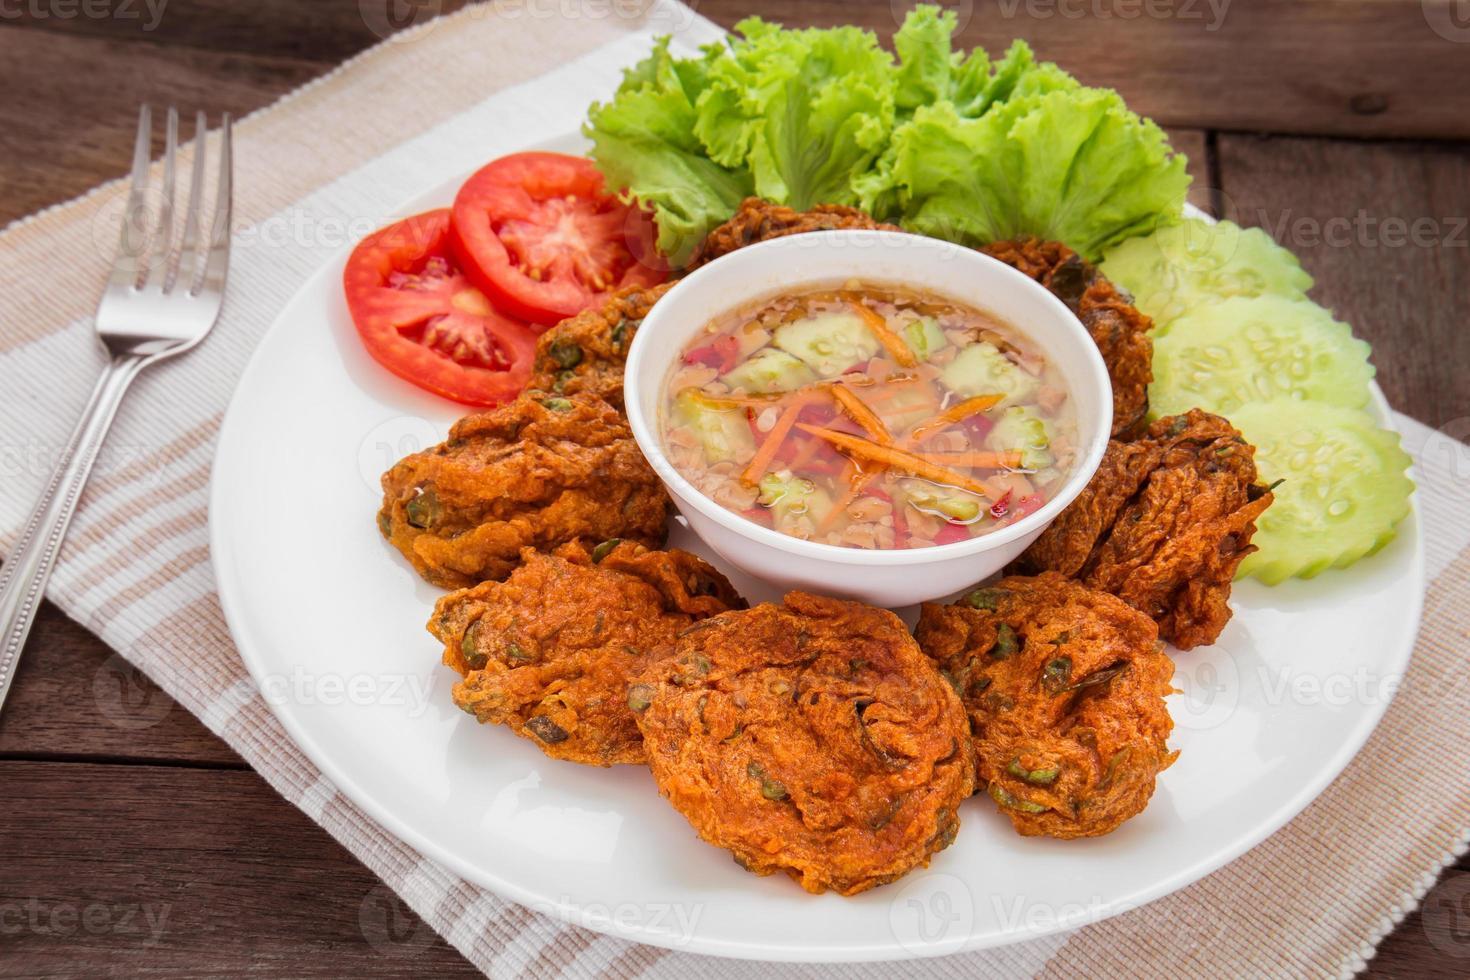 bolo de peixe frito e legumes no prato, comida tailandesa foto